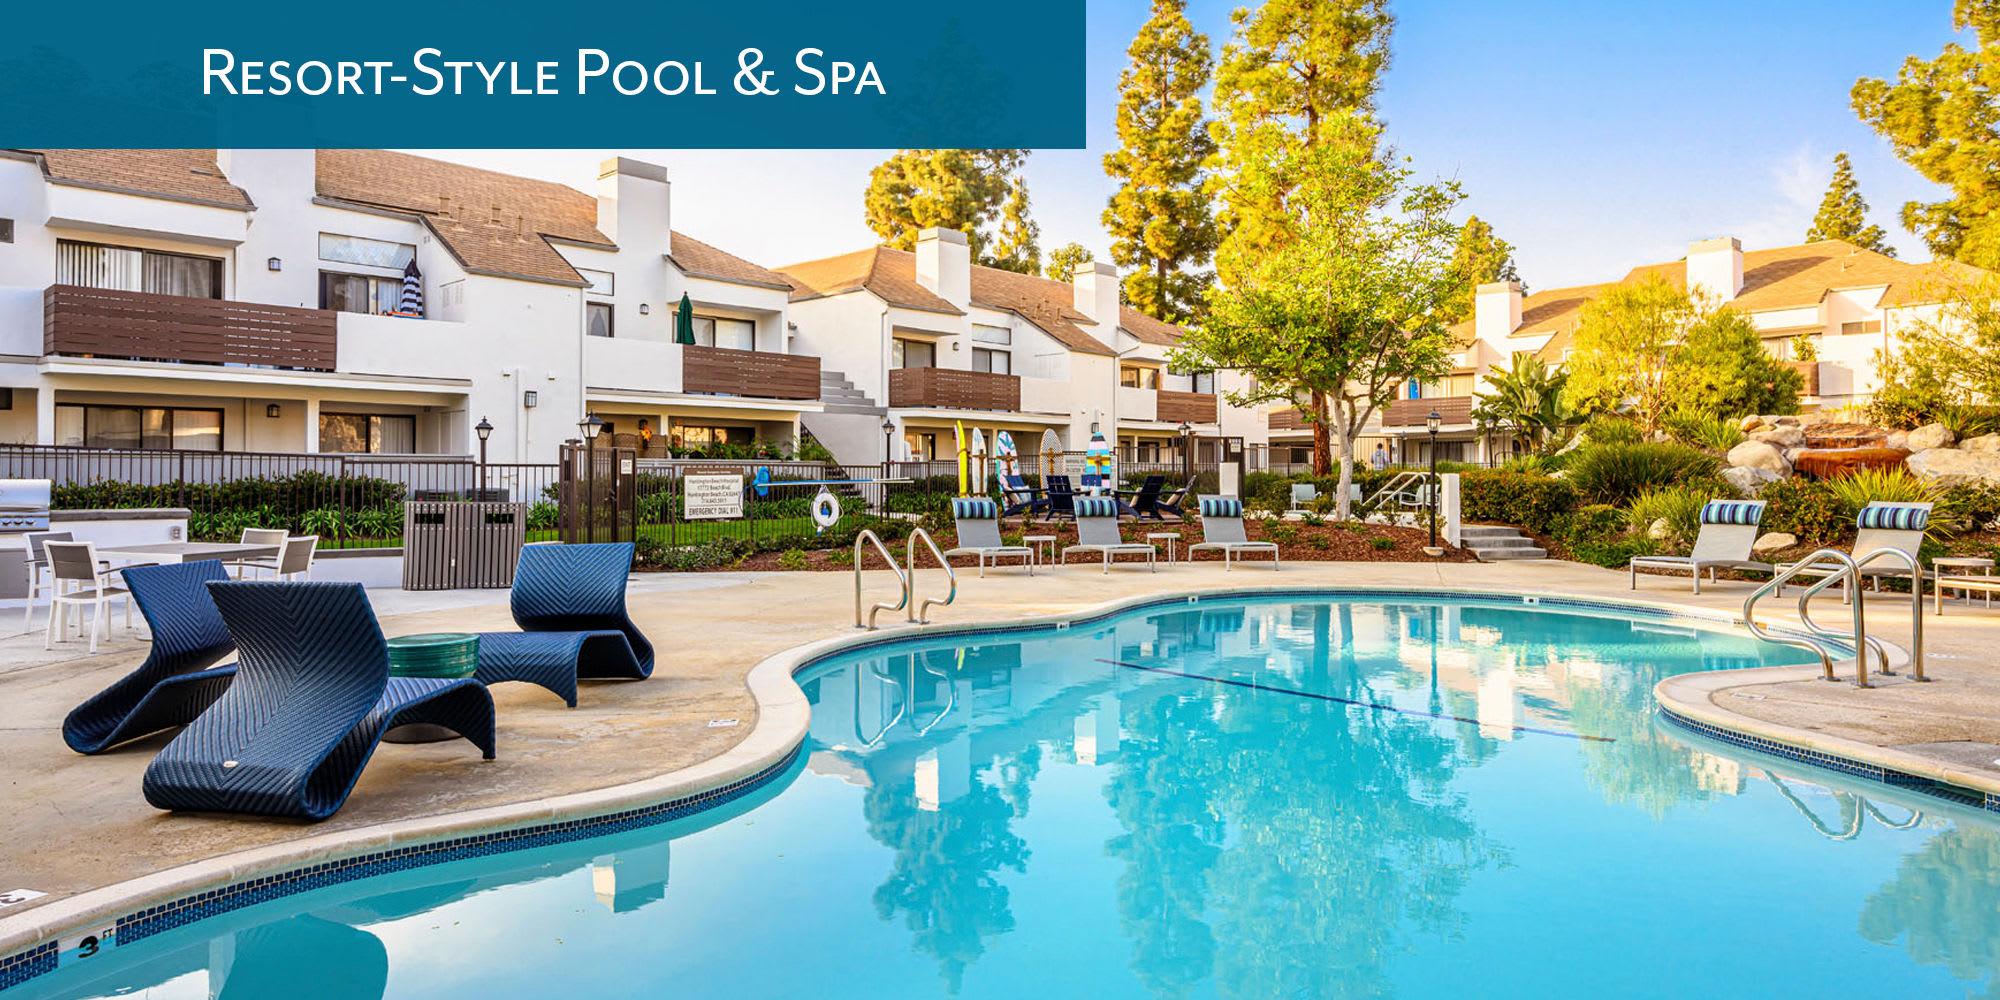 Resort-style swimming pool and spa at Sendero Huntington Beach in Huntington Beach, California